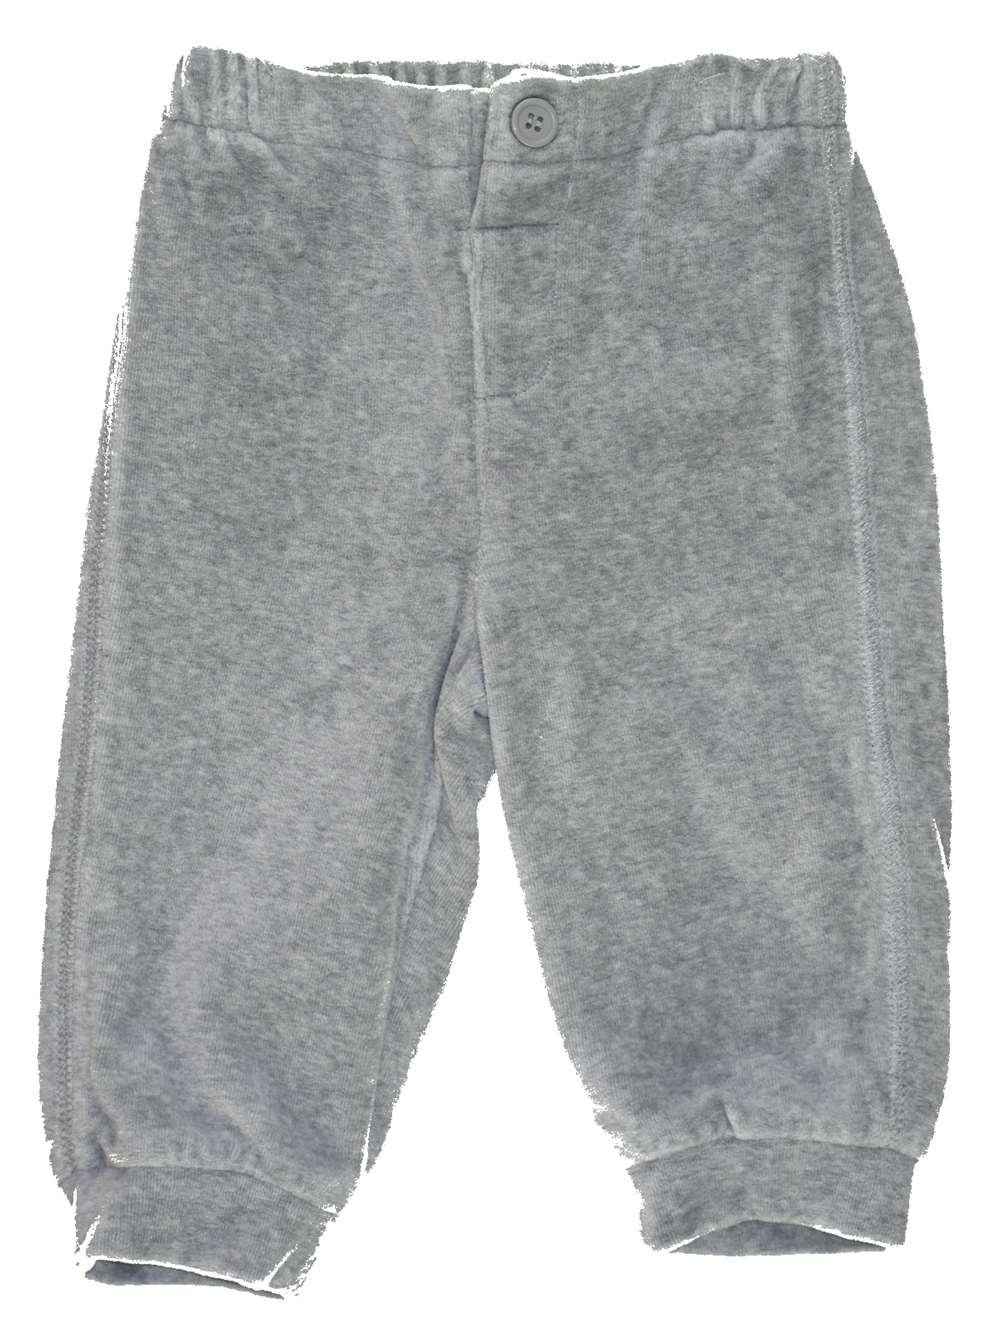 pantalon garcon kiabi 9 mois pas cher. Black Bedroom Furniture Sets. Home Design Ideas